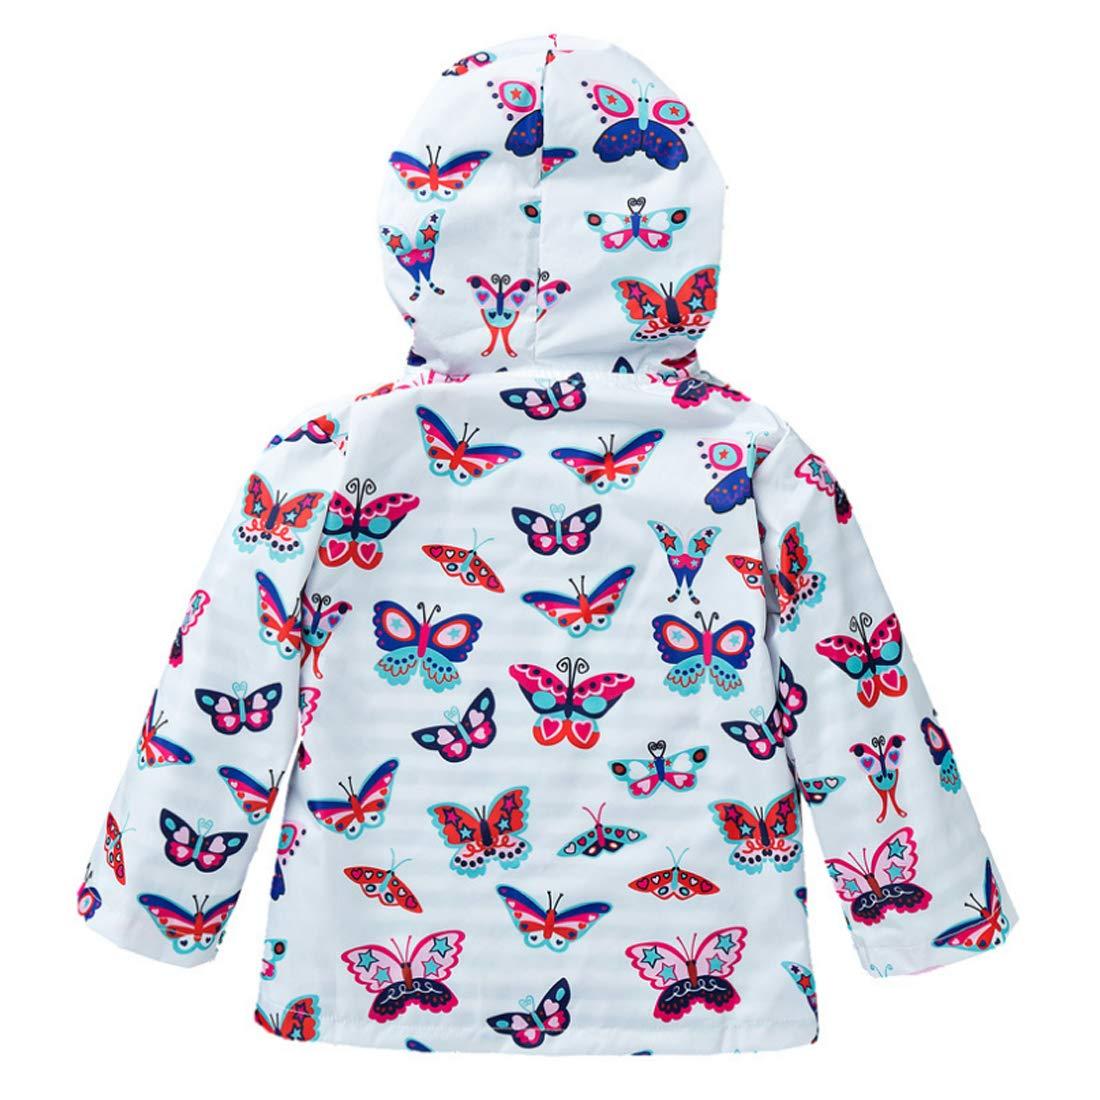 Inlefen Little Girls Child Hooded Jacket Outwear Rain Suit Coat Girls 2-8 Years